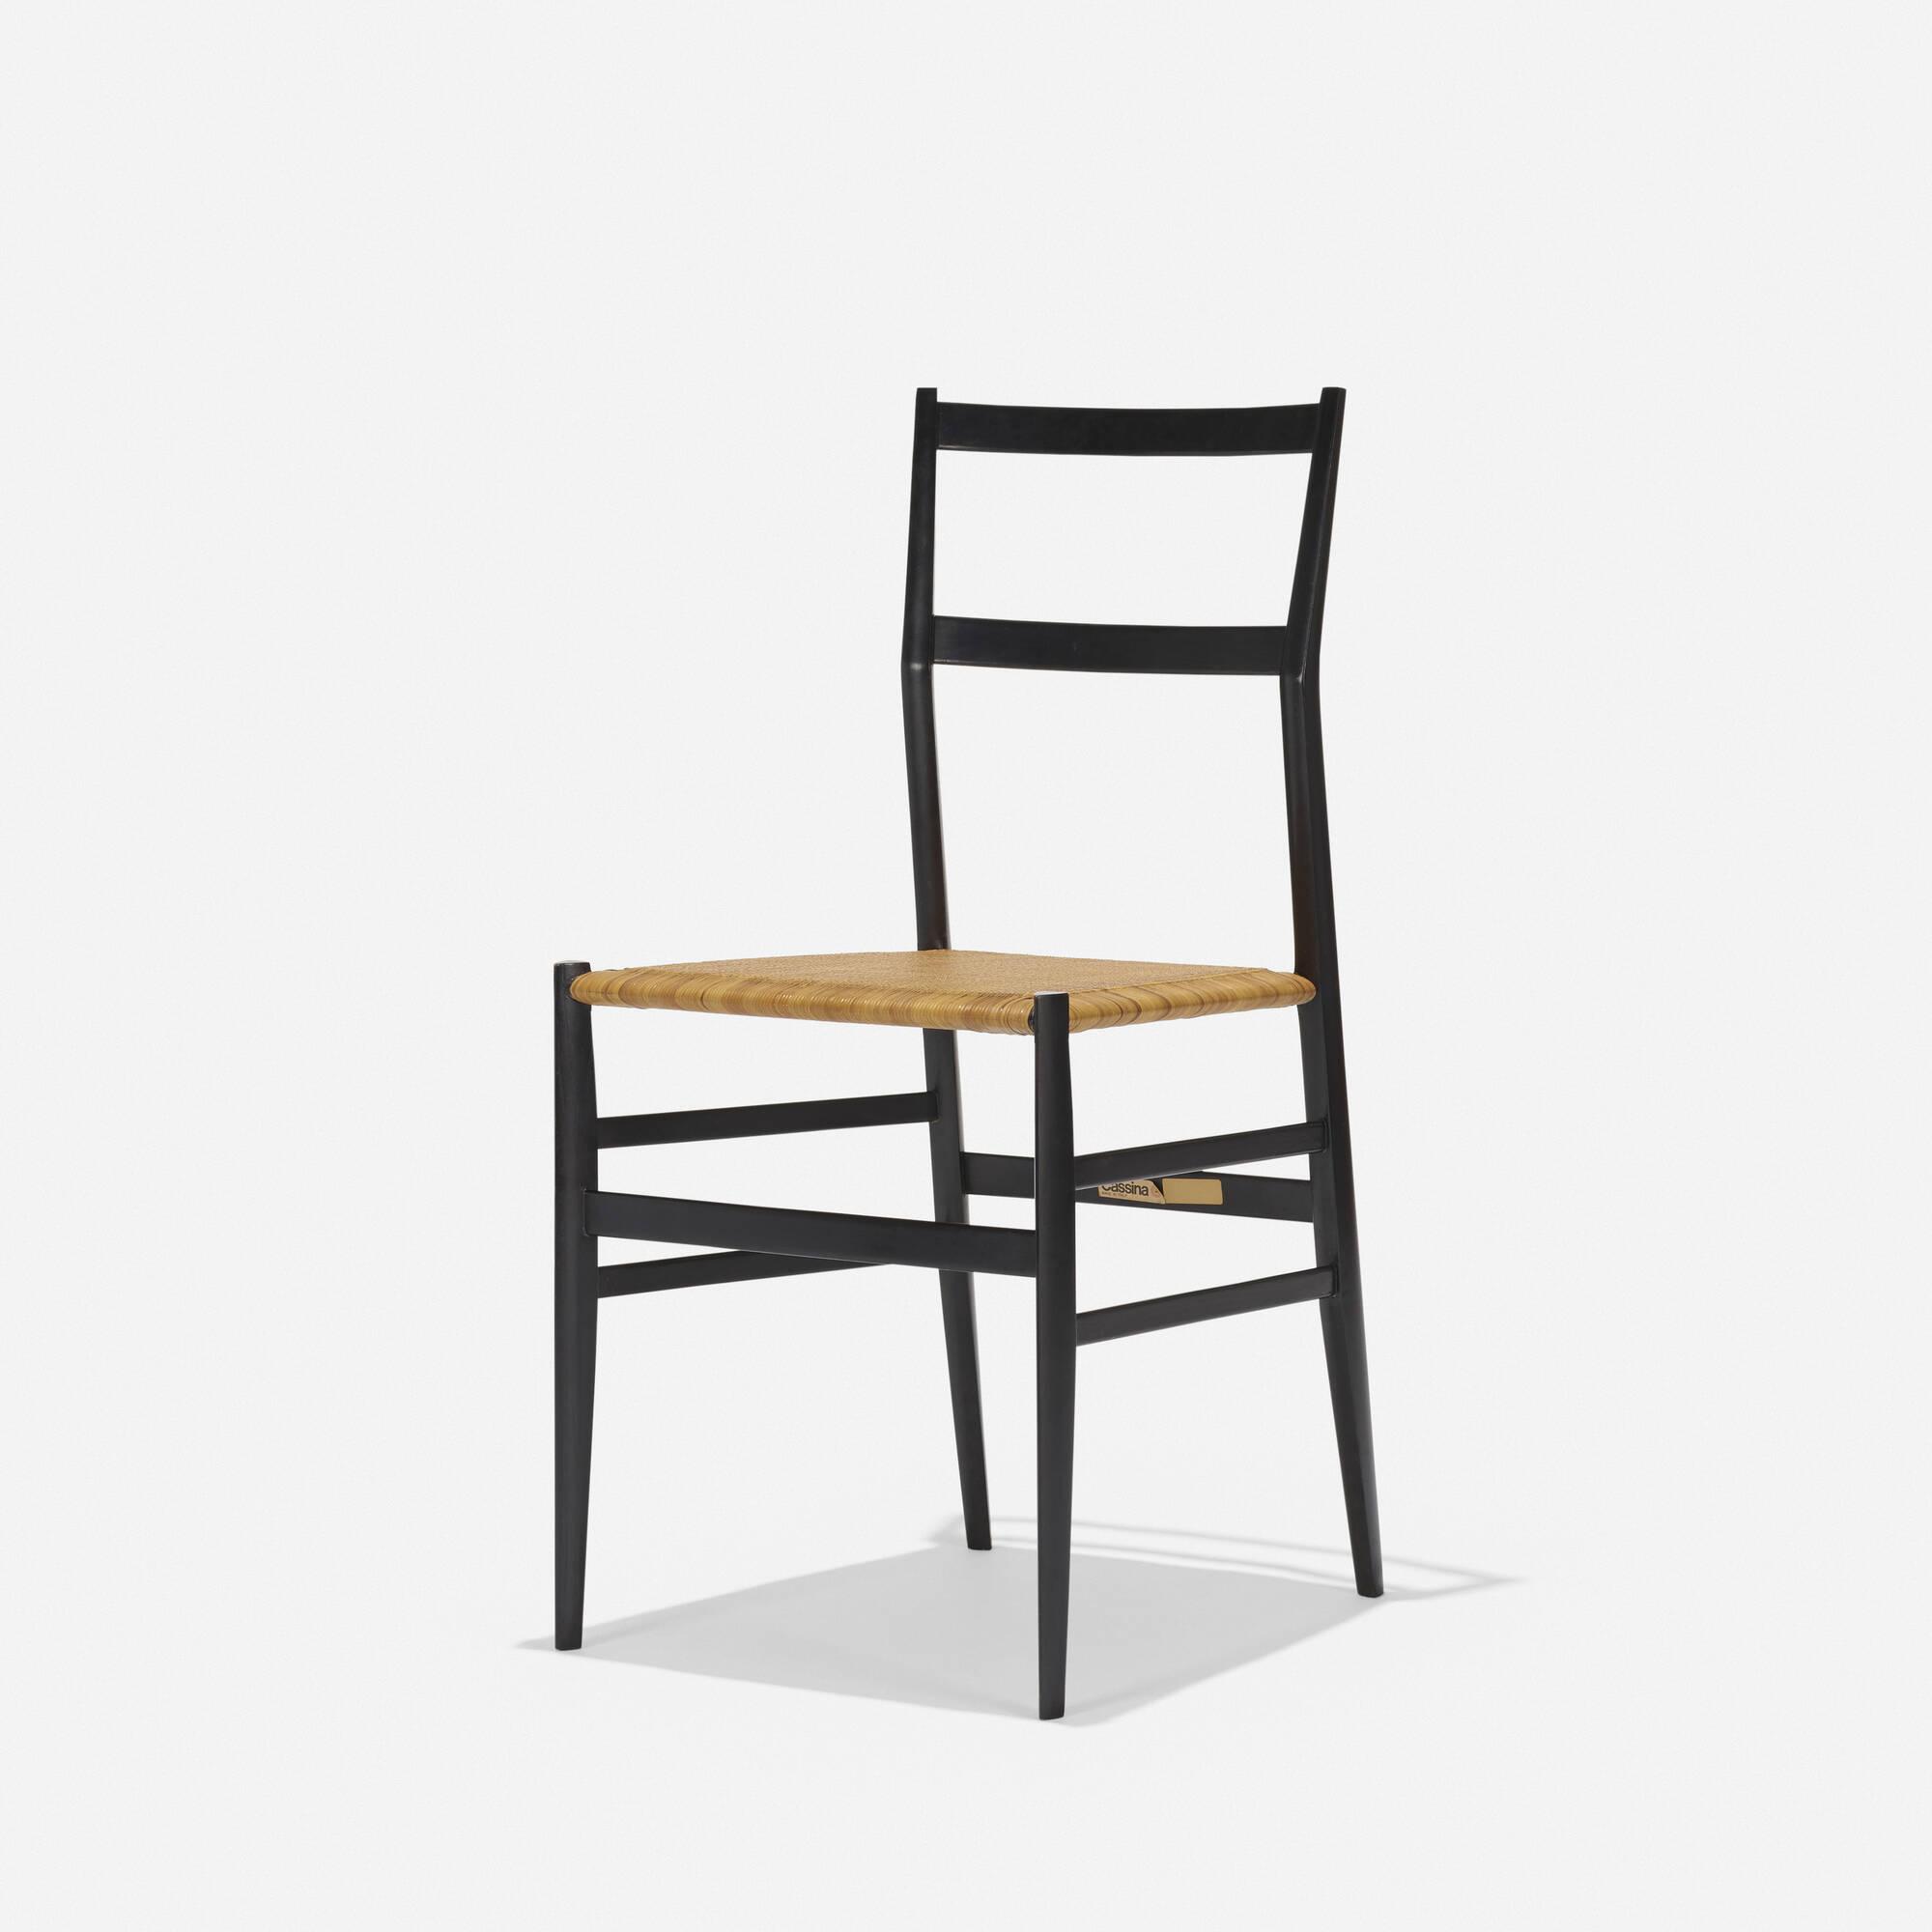 427: Gio Ponti / Superleggera Chair (1 Of 3)